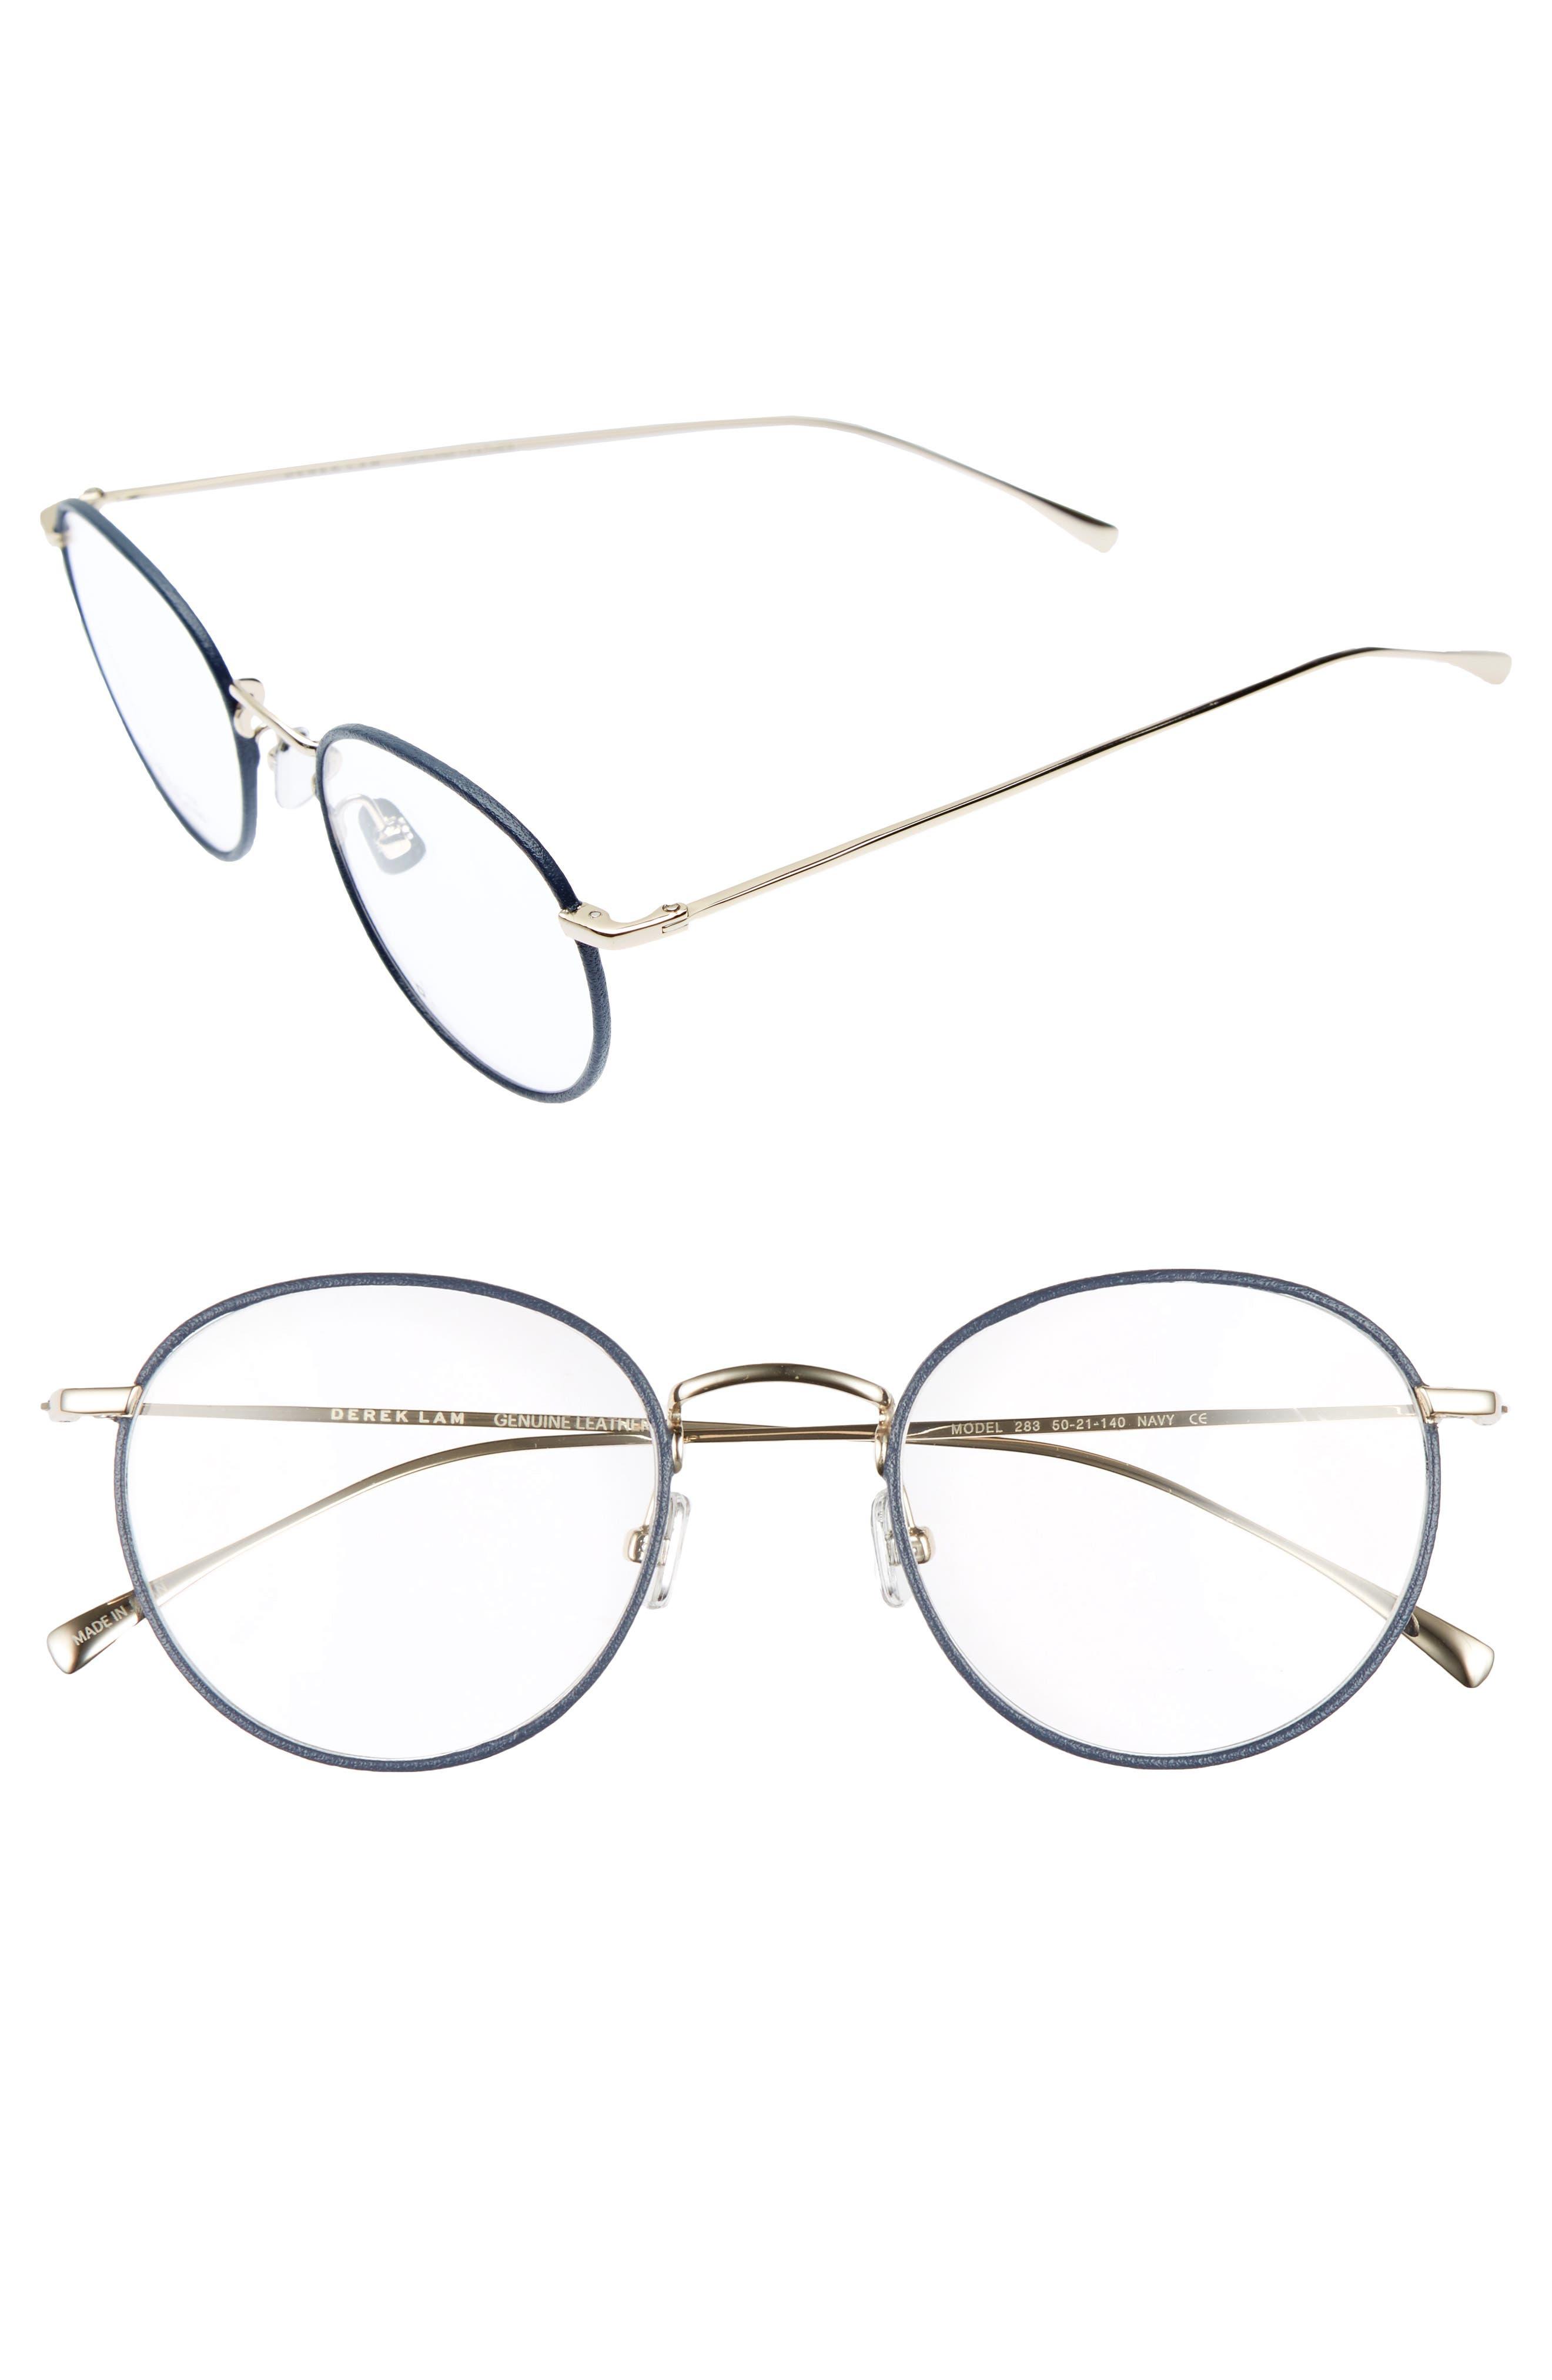 50mm Optical Glasses,                             Main thumbnail 1, color,                             Navy